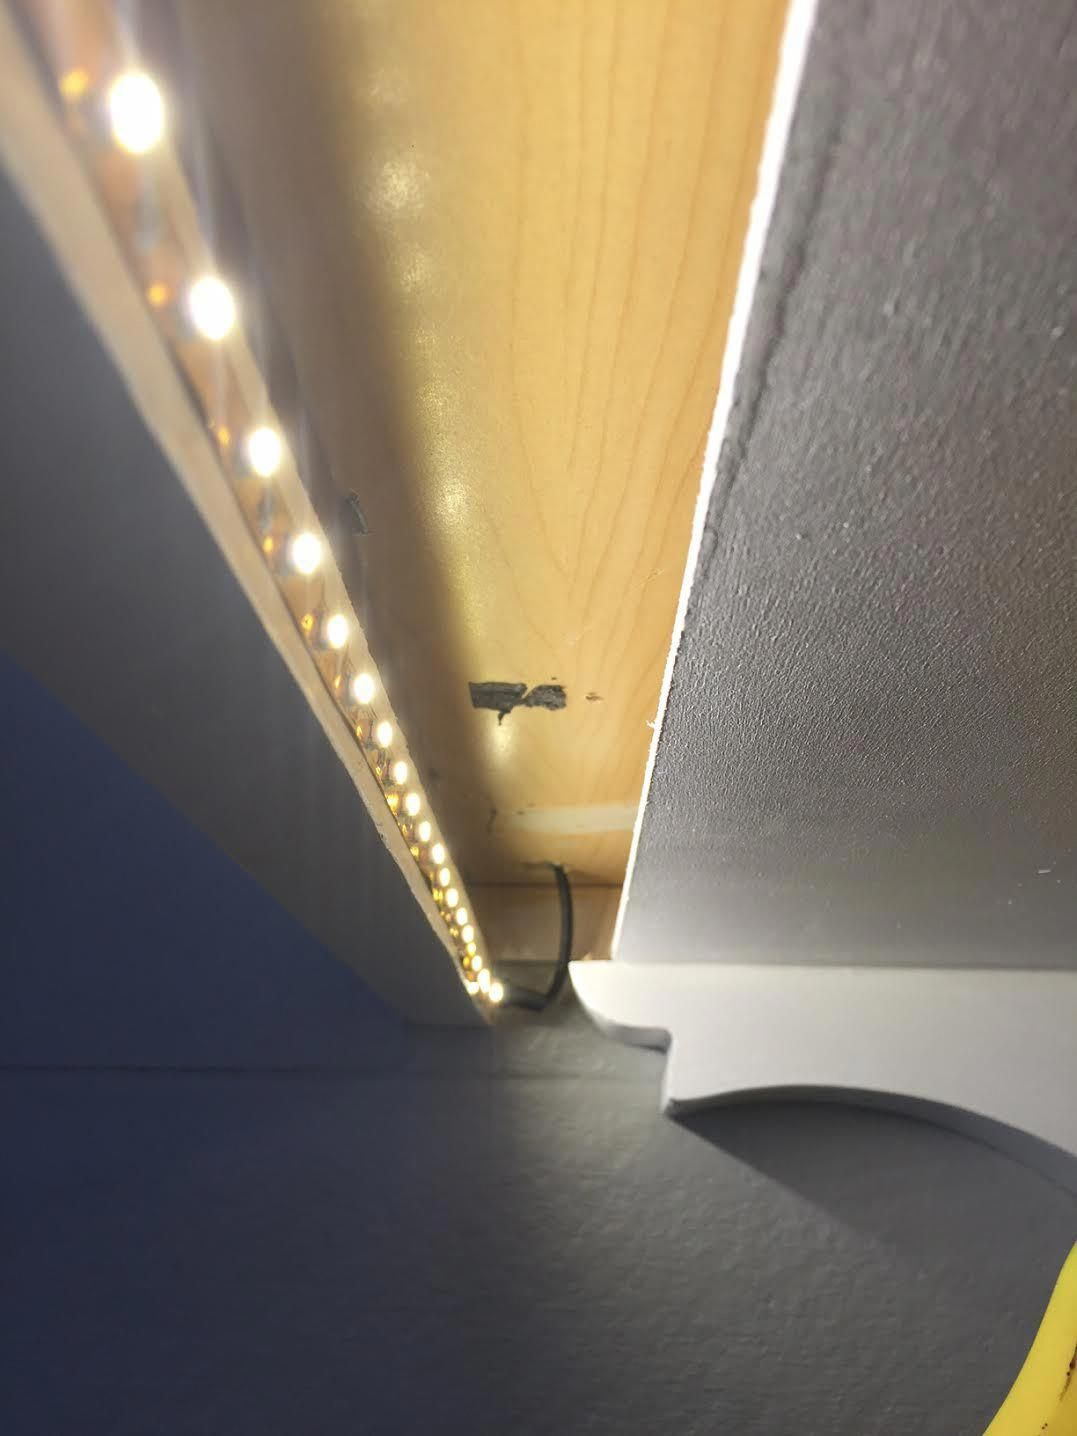 Diy Upper And Lower Cabinet Lighting Diy Kitchen Lighting Over Cabinet Lighting Led Lighting Diy